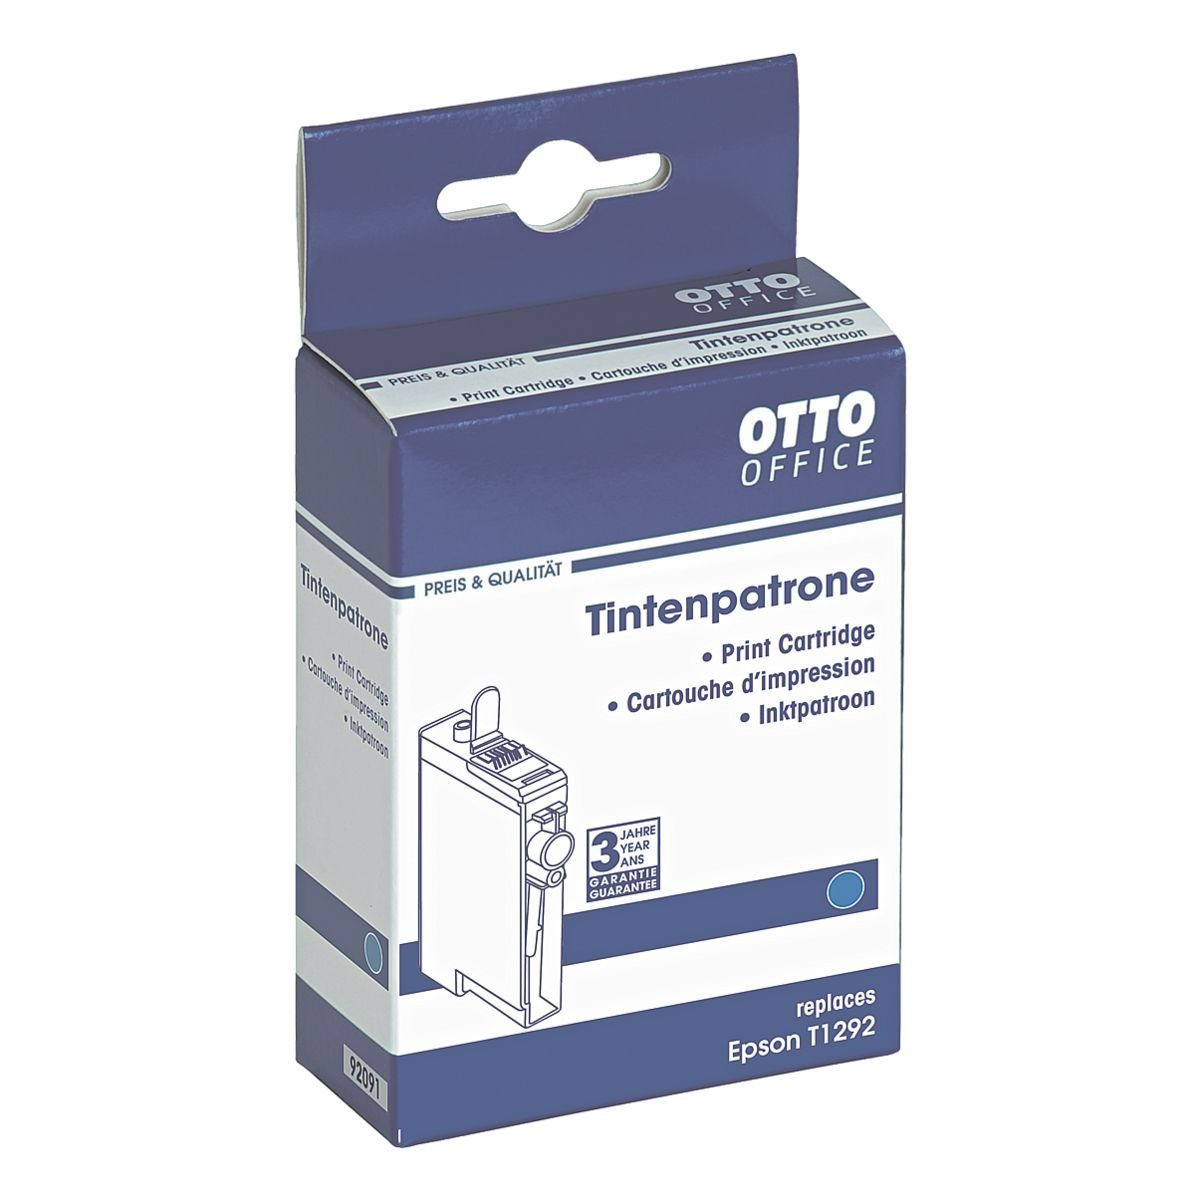 OTTO Office Tintenpatrone ersetzt Epson »T1292«